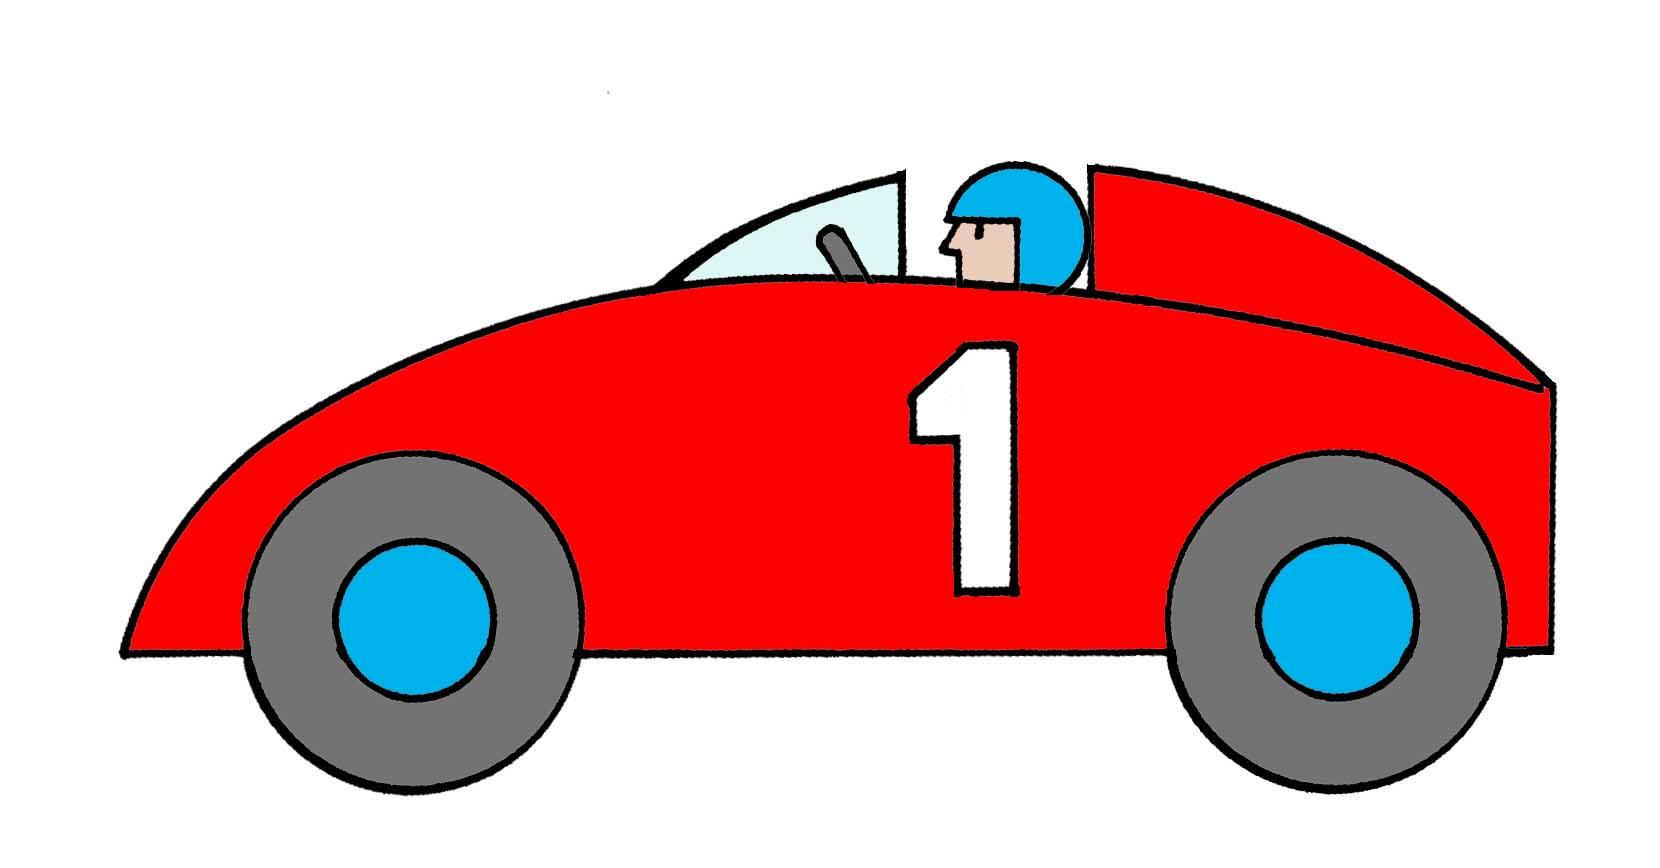 1660x868 Racing Clipart 2 Car